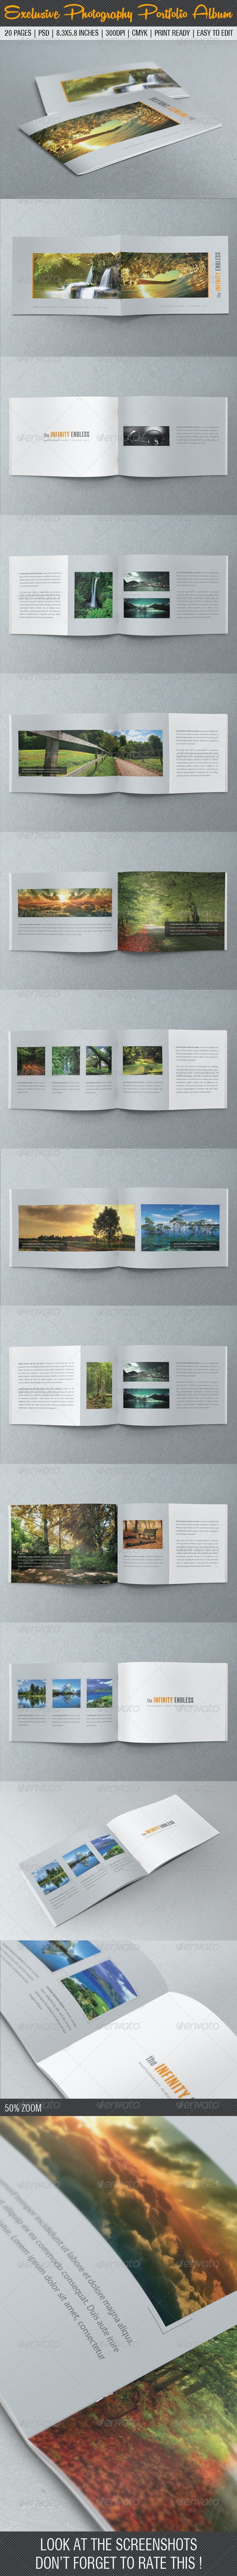 Exclusive Photography Portfolio Album - Photo Albums Print Templates